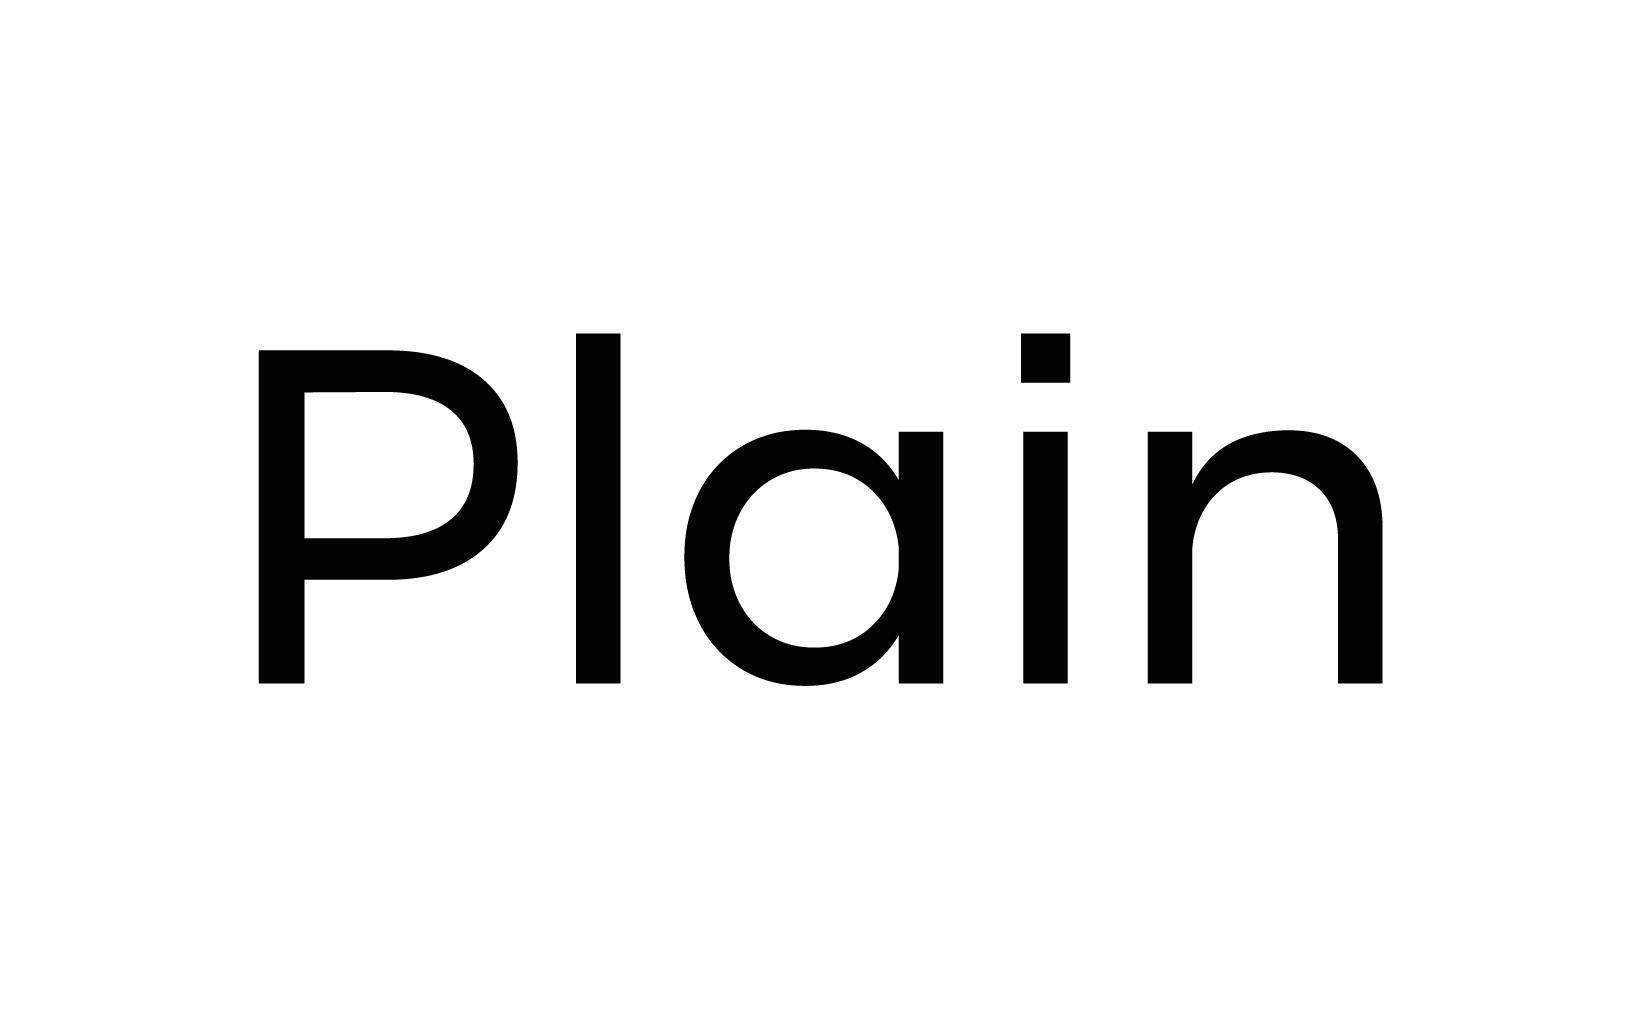 bp_plain_logo_positive